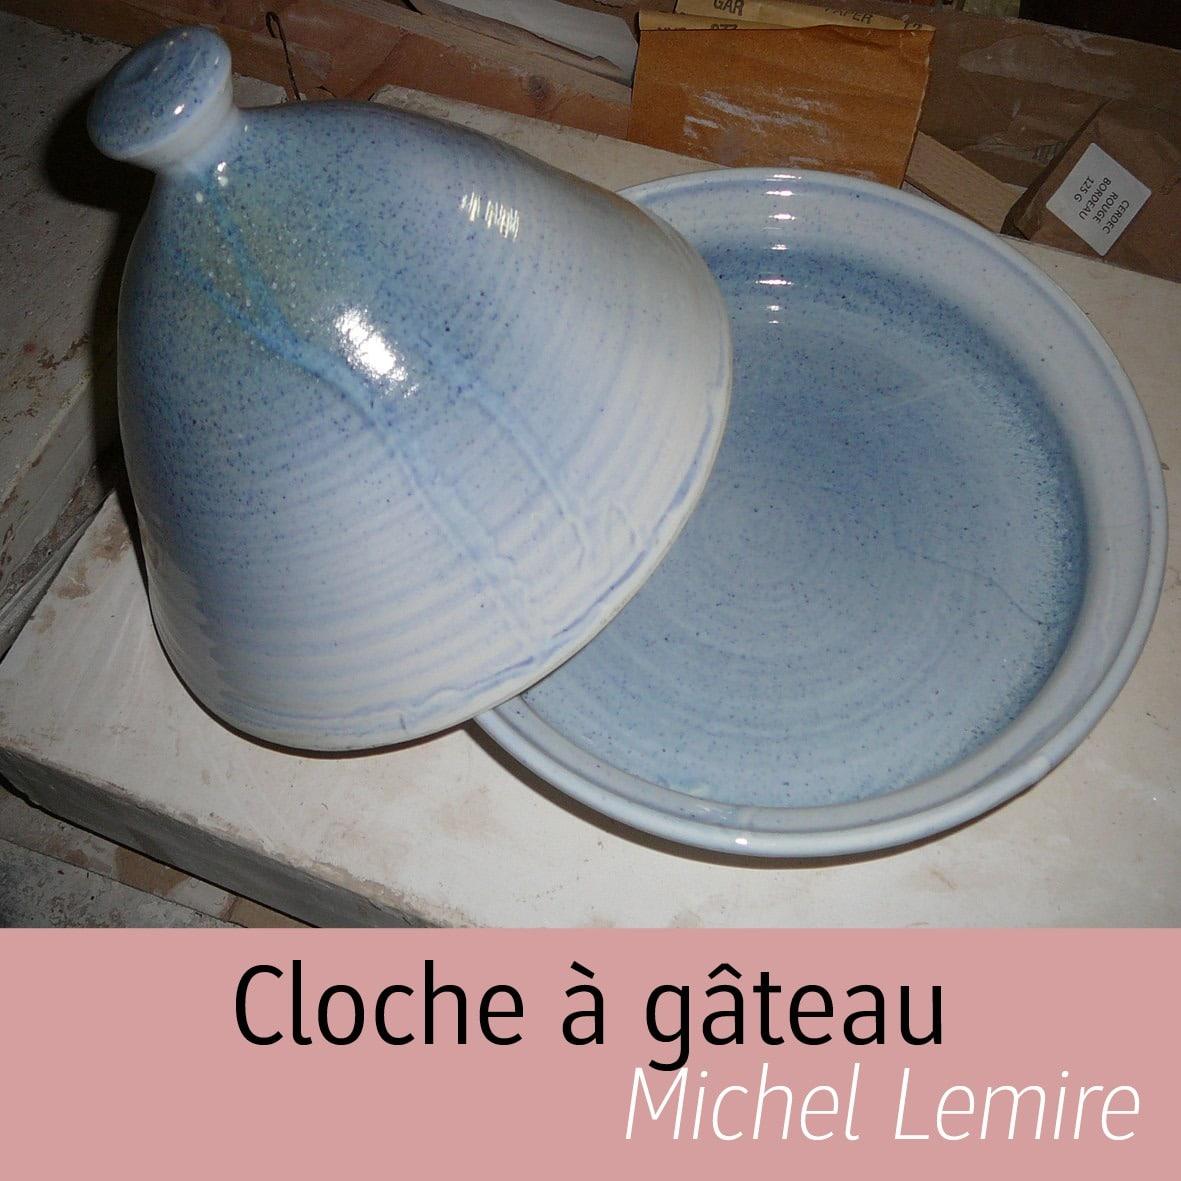 Cloche à gâteau Michel Lemire